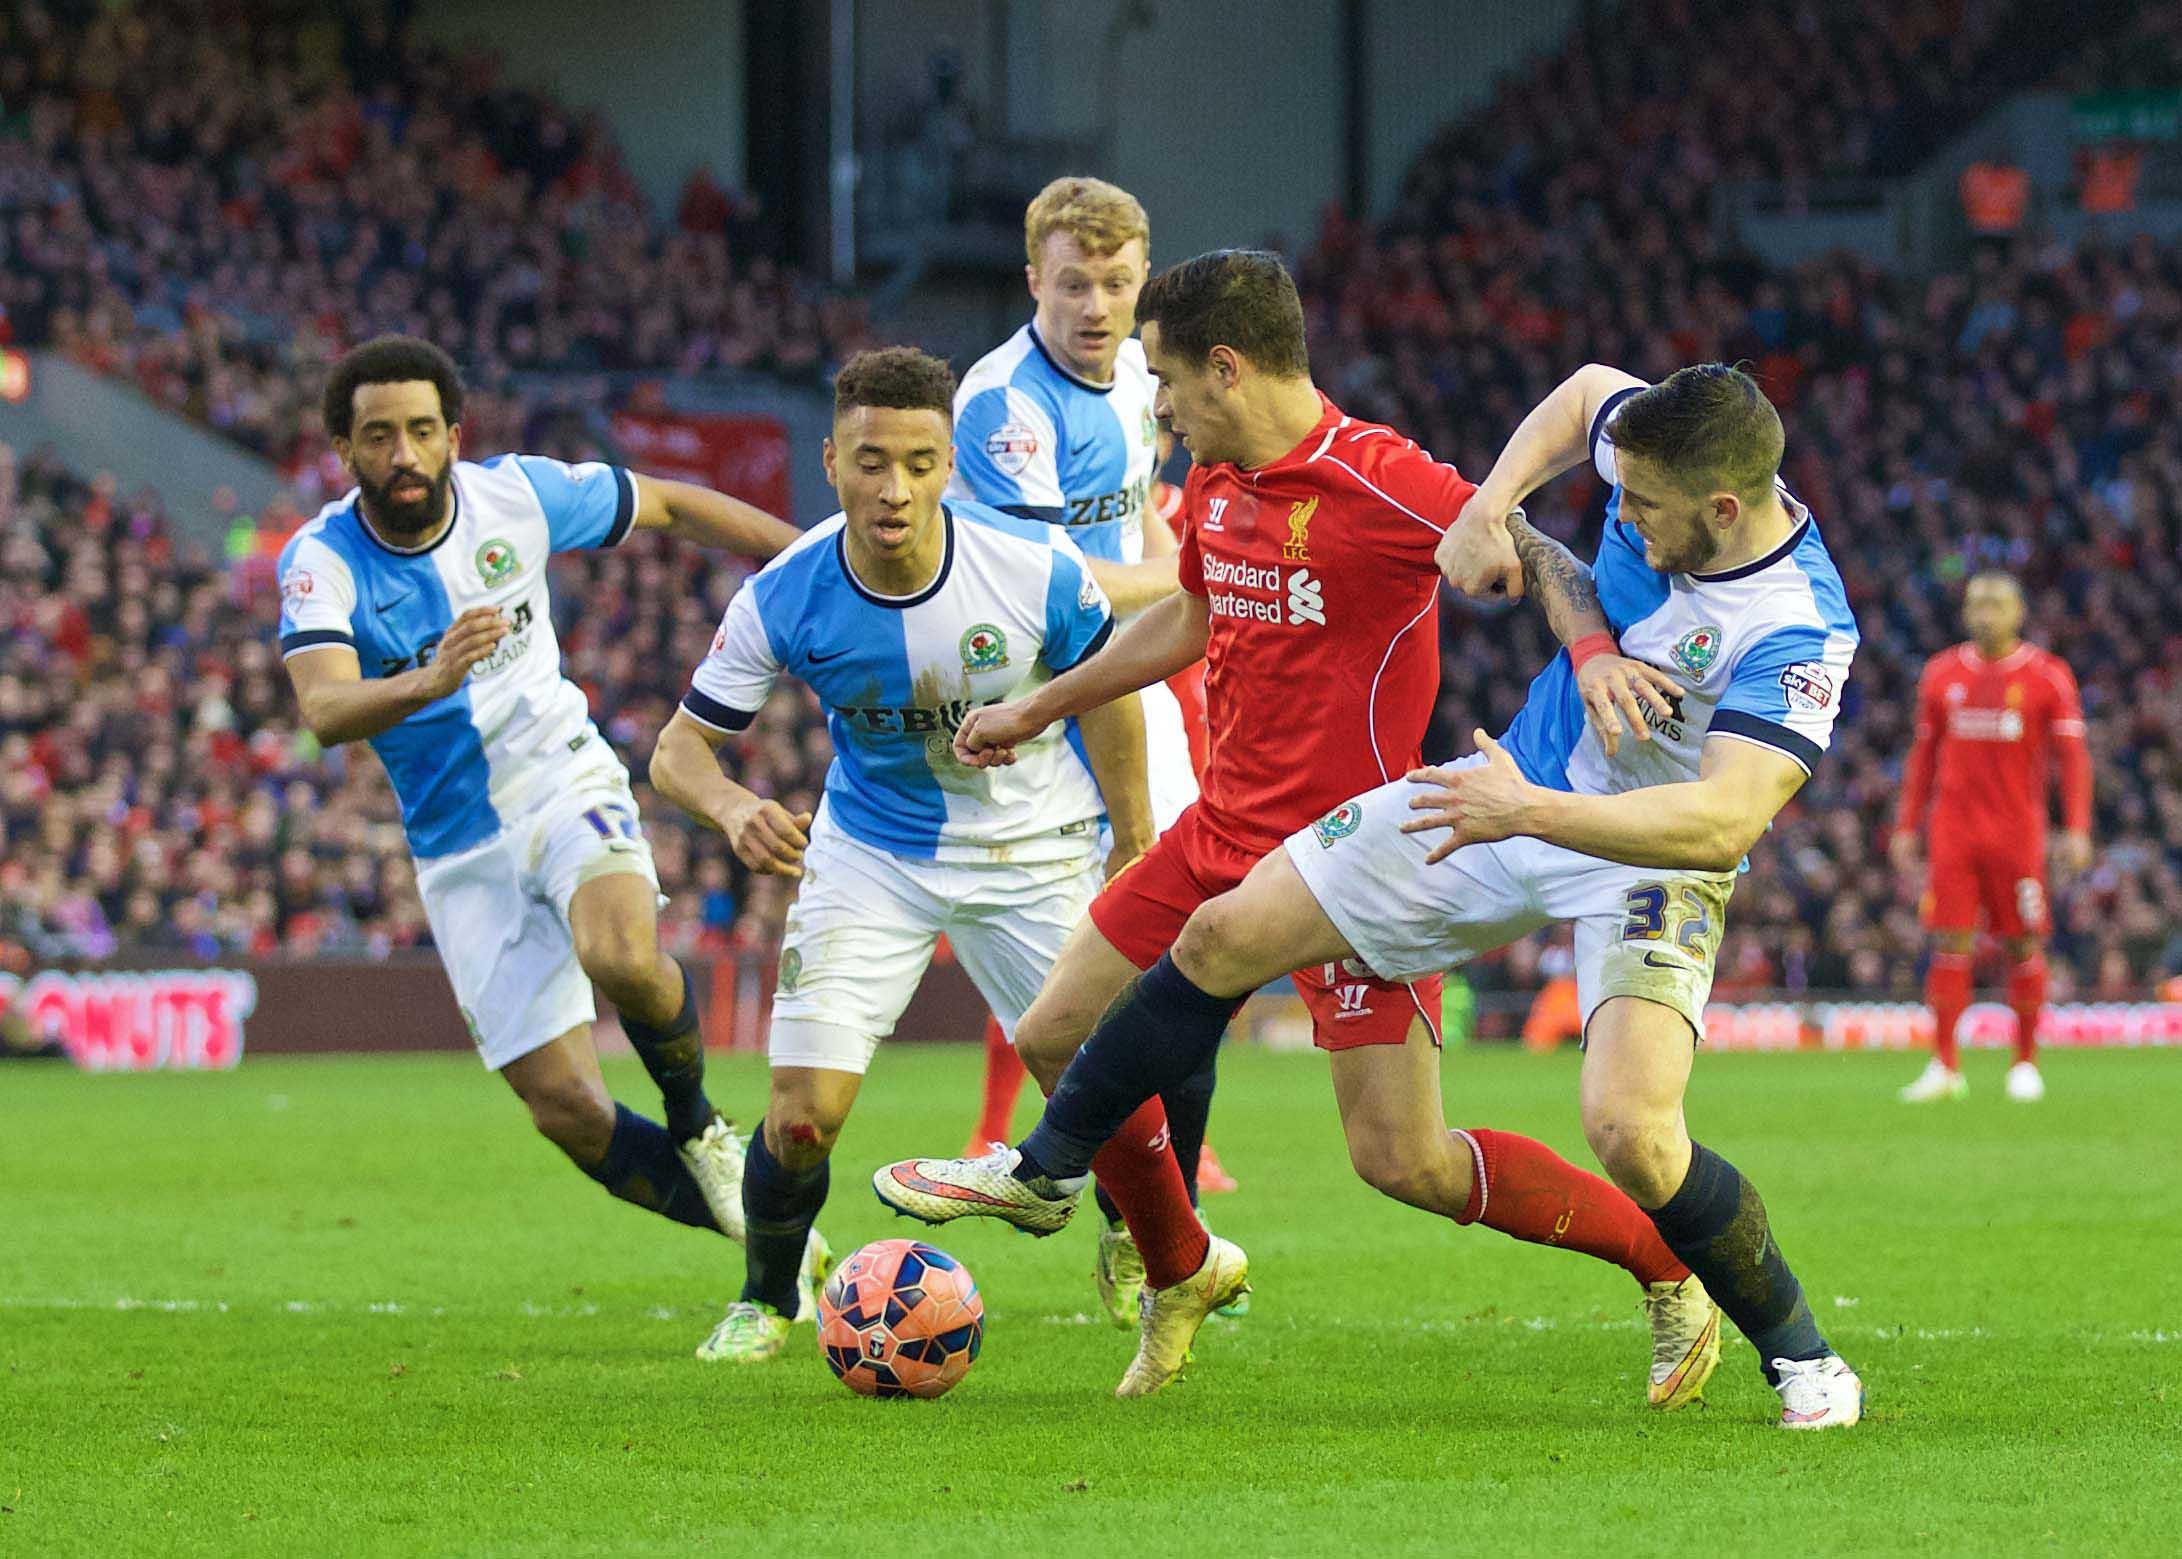 Football - FA Cup - 3rd Round - Everton FC v Blackburn Rovers FC